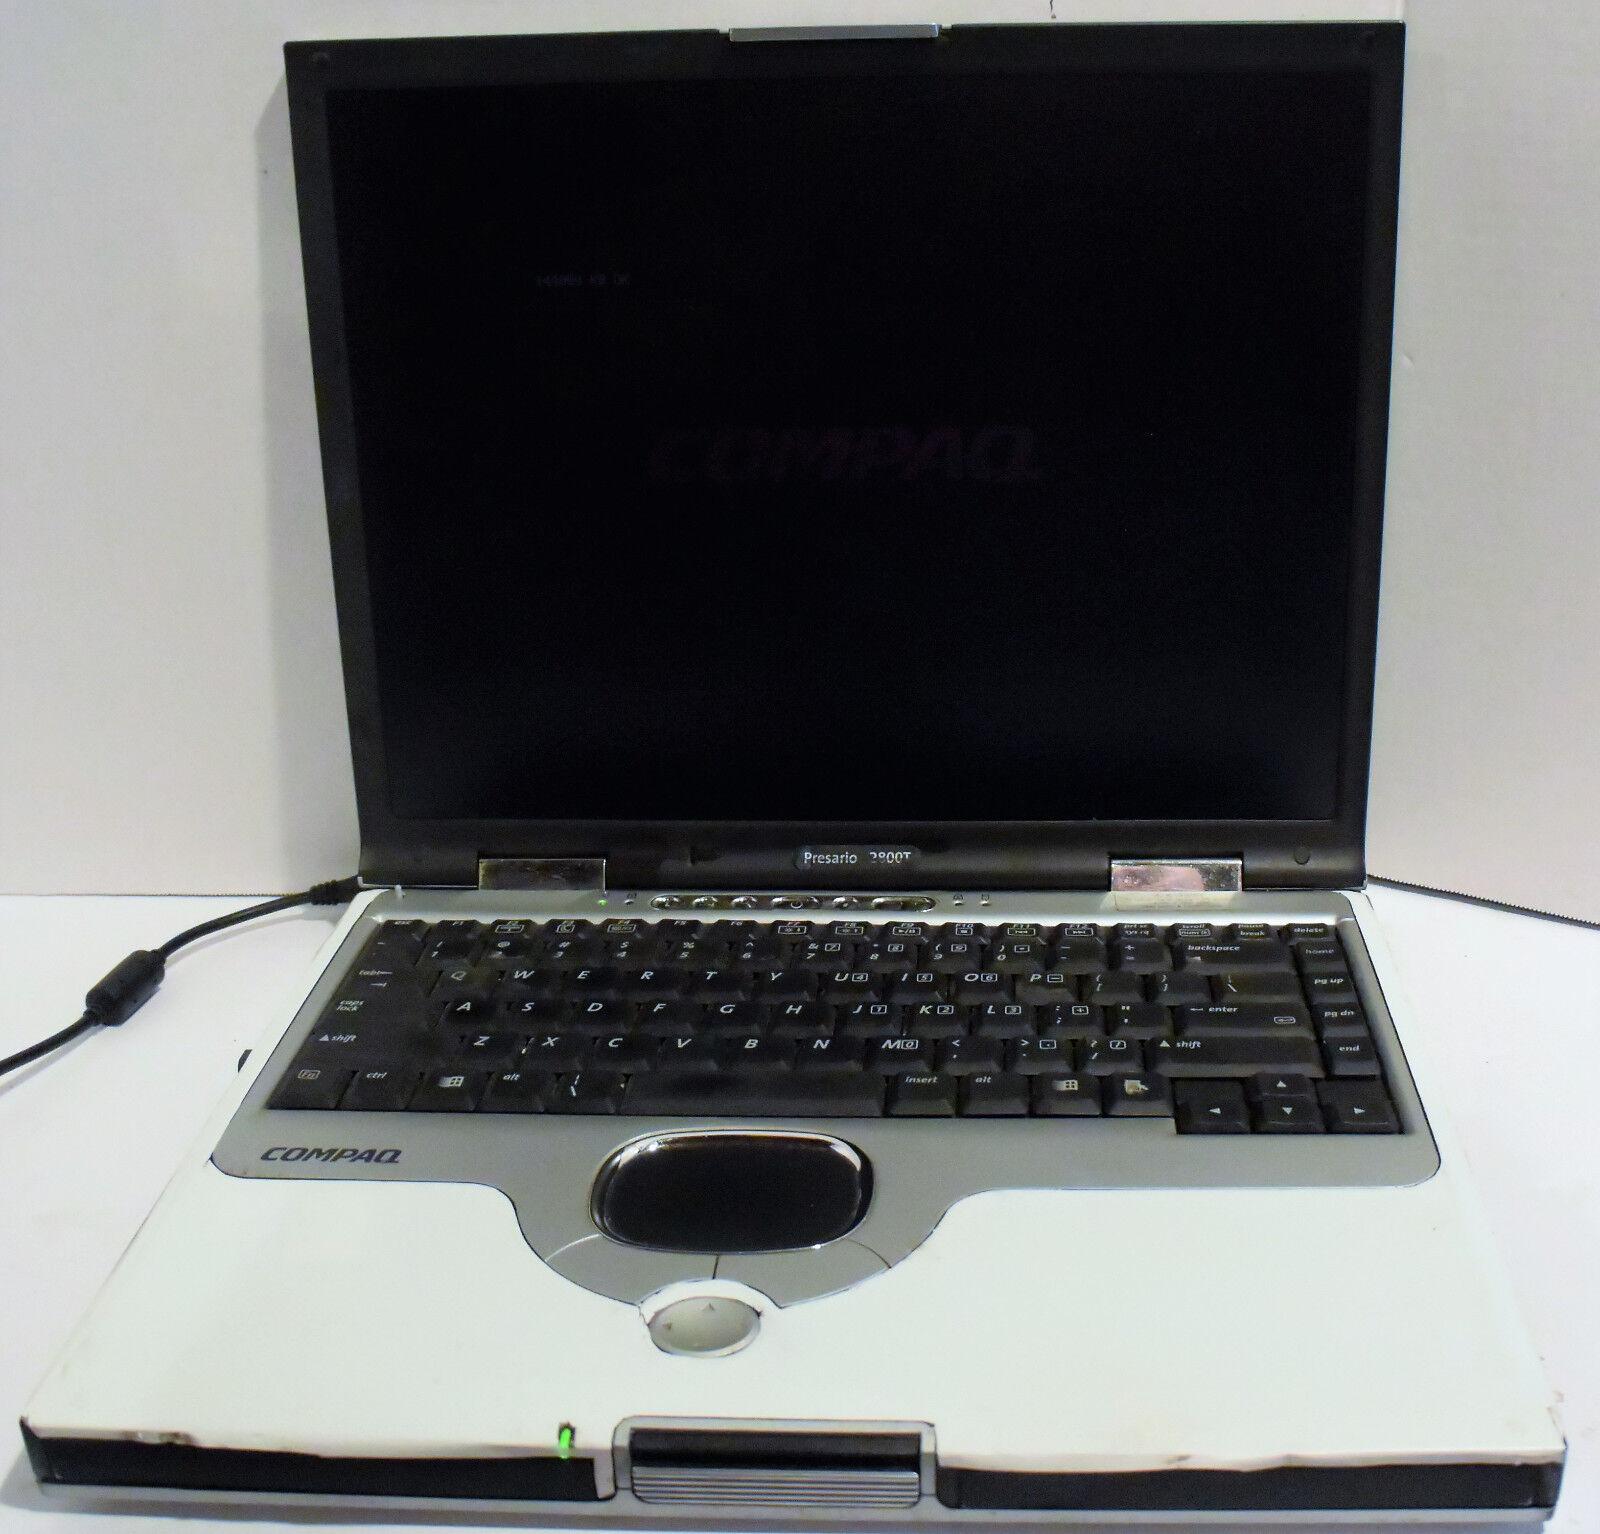 Compaq Presario 2800T 15'' Notebook - Parts/Repair AS IS